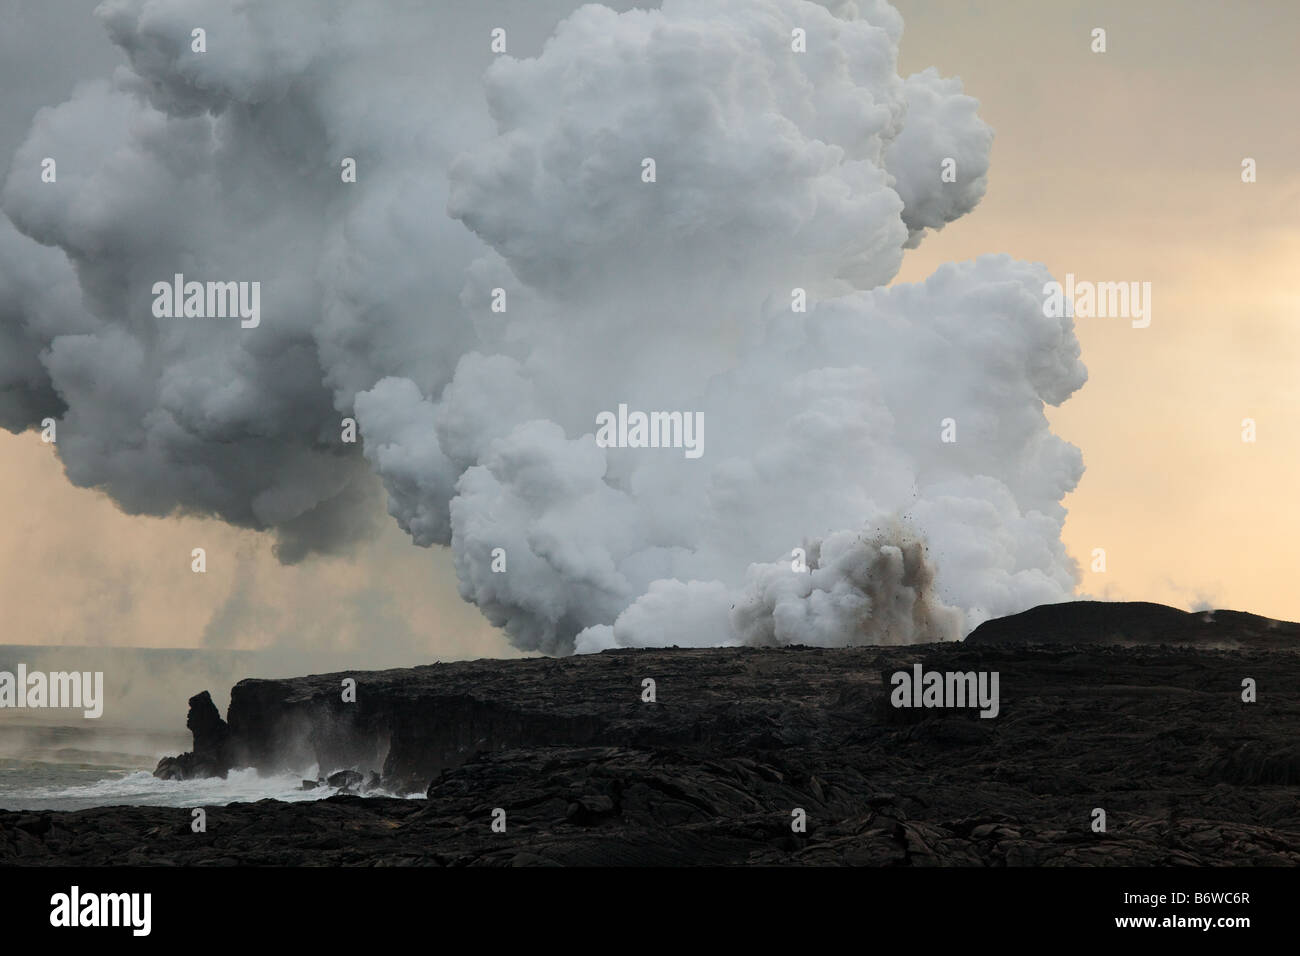 Steam plume and volcanic eruption at Kalapana, Big Island, Hawaii, USA - Stock Image